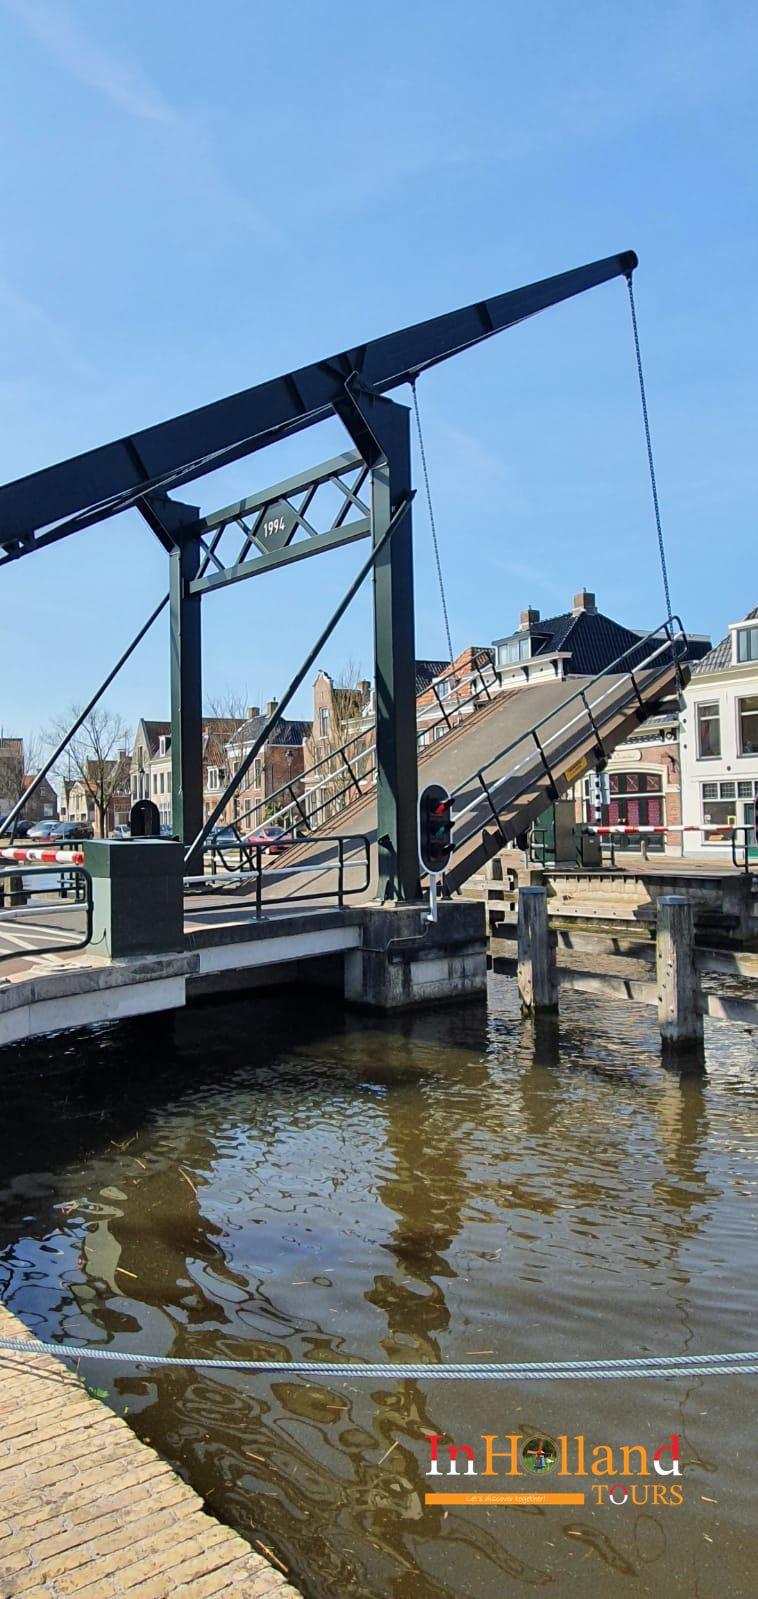 Makkum village, the Netherlands